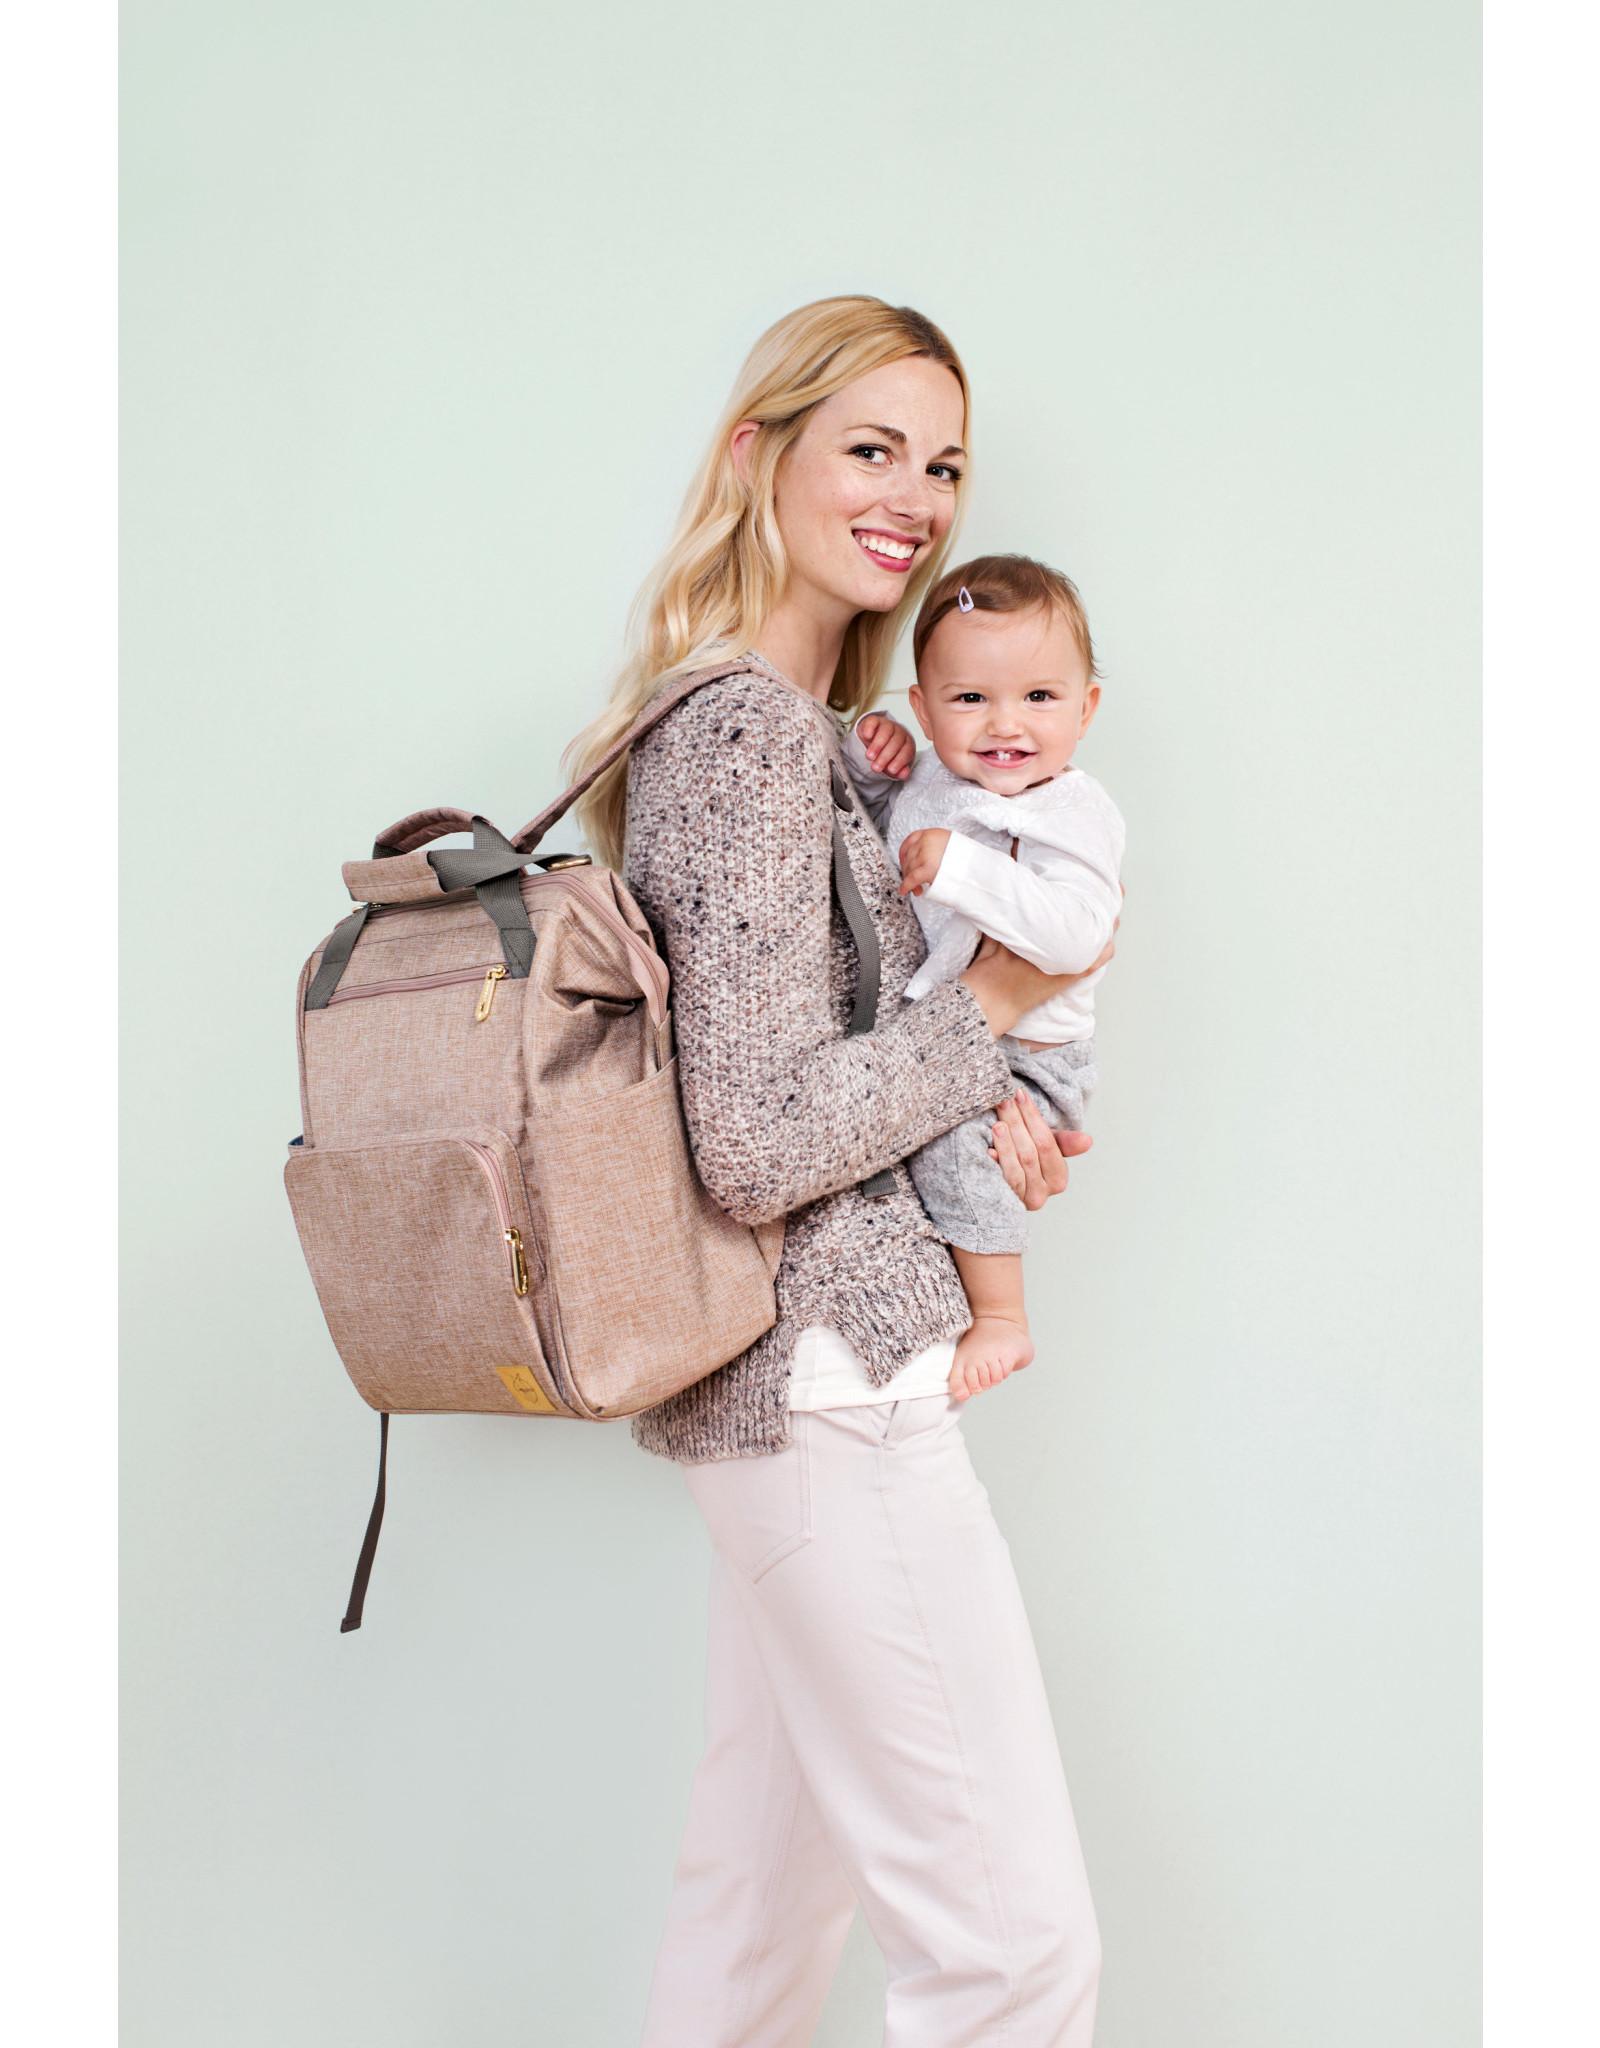 Lassig Lassig Glam Goldie Backpack Rose